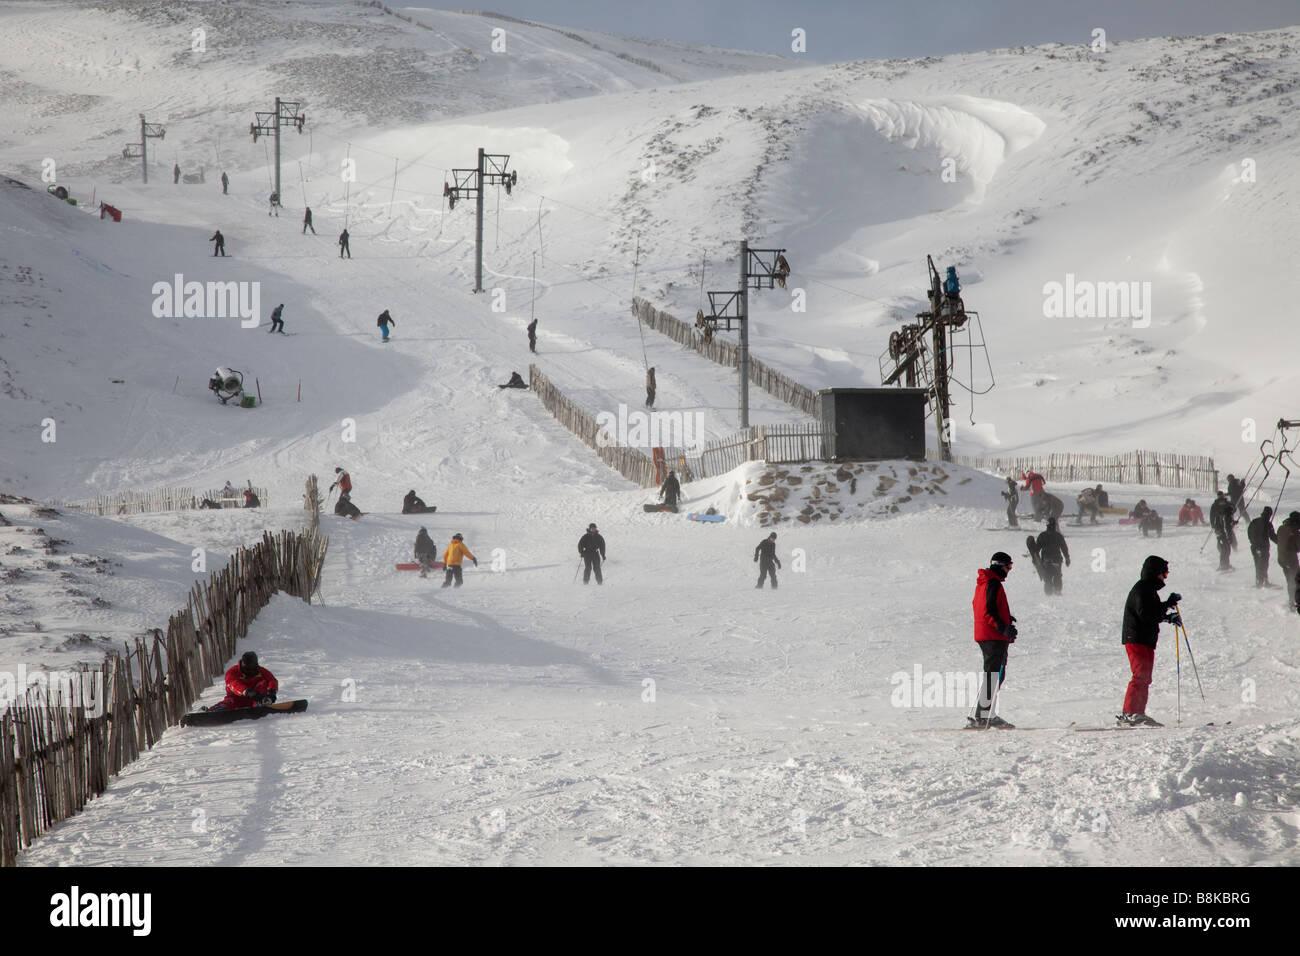 wooden fencing, holiday, skiing, peak, slope. scottish winter snow